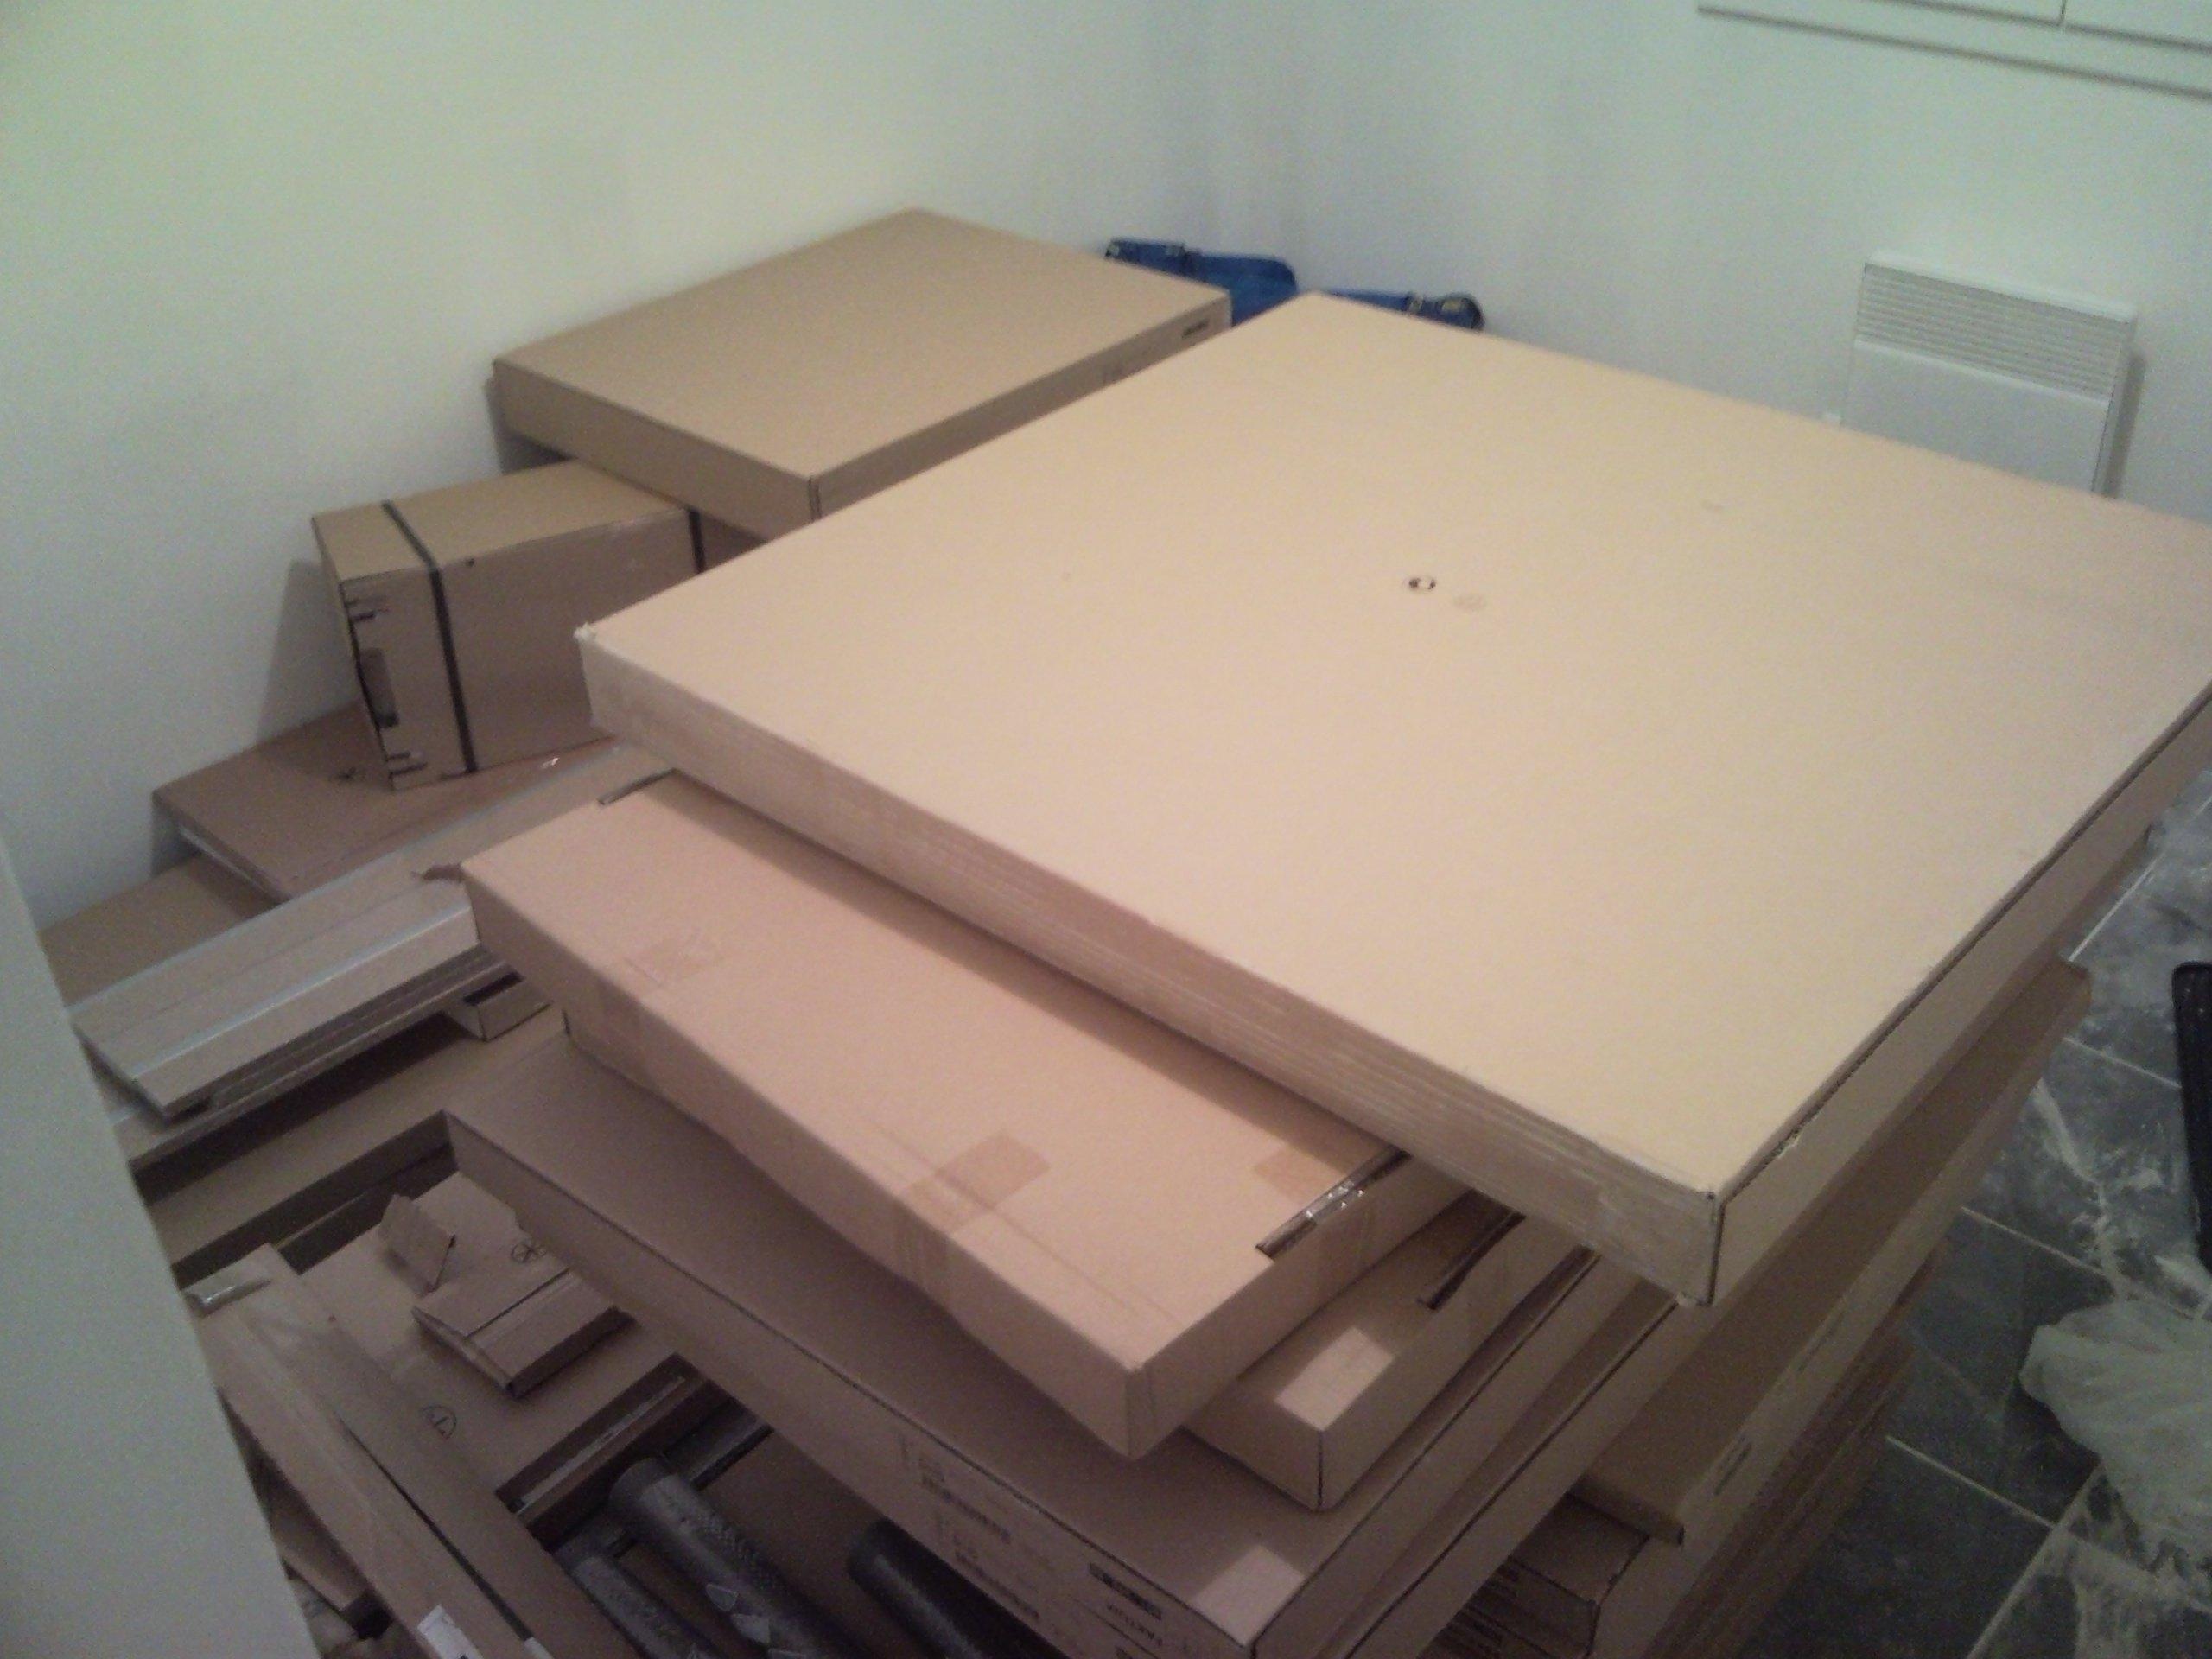 2008 novembre 23 notre construction. Black Bedroom Furniture Sets. Home Design Ideas